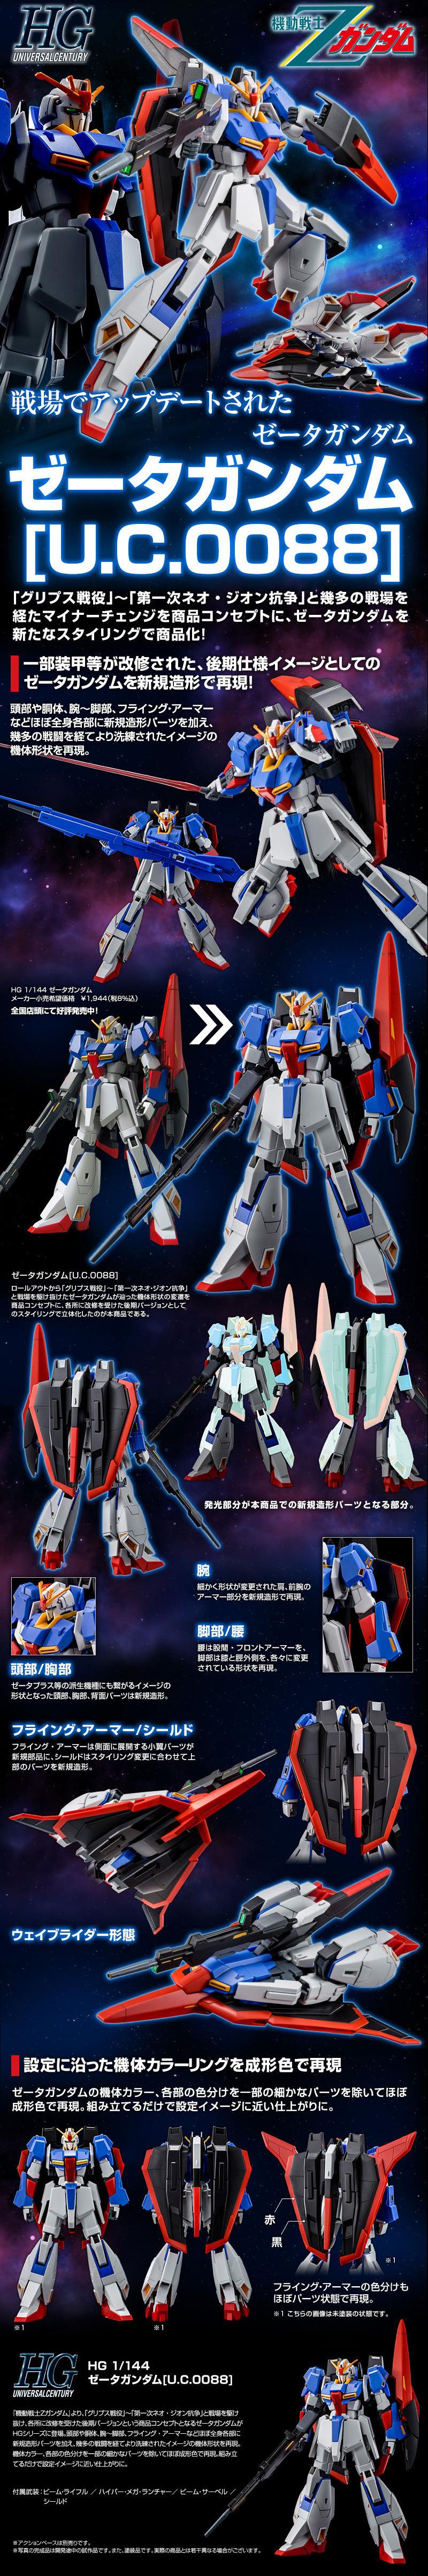 P-Bandai HGUC Zeta Gundam 0088 Details